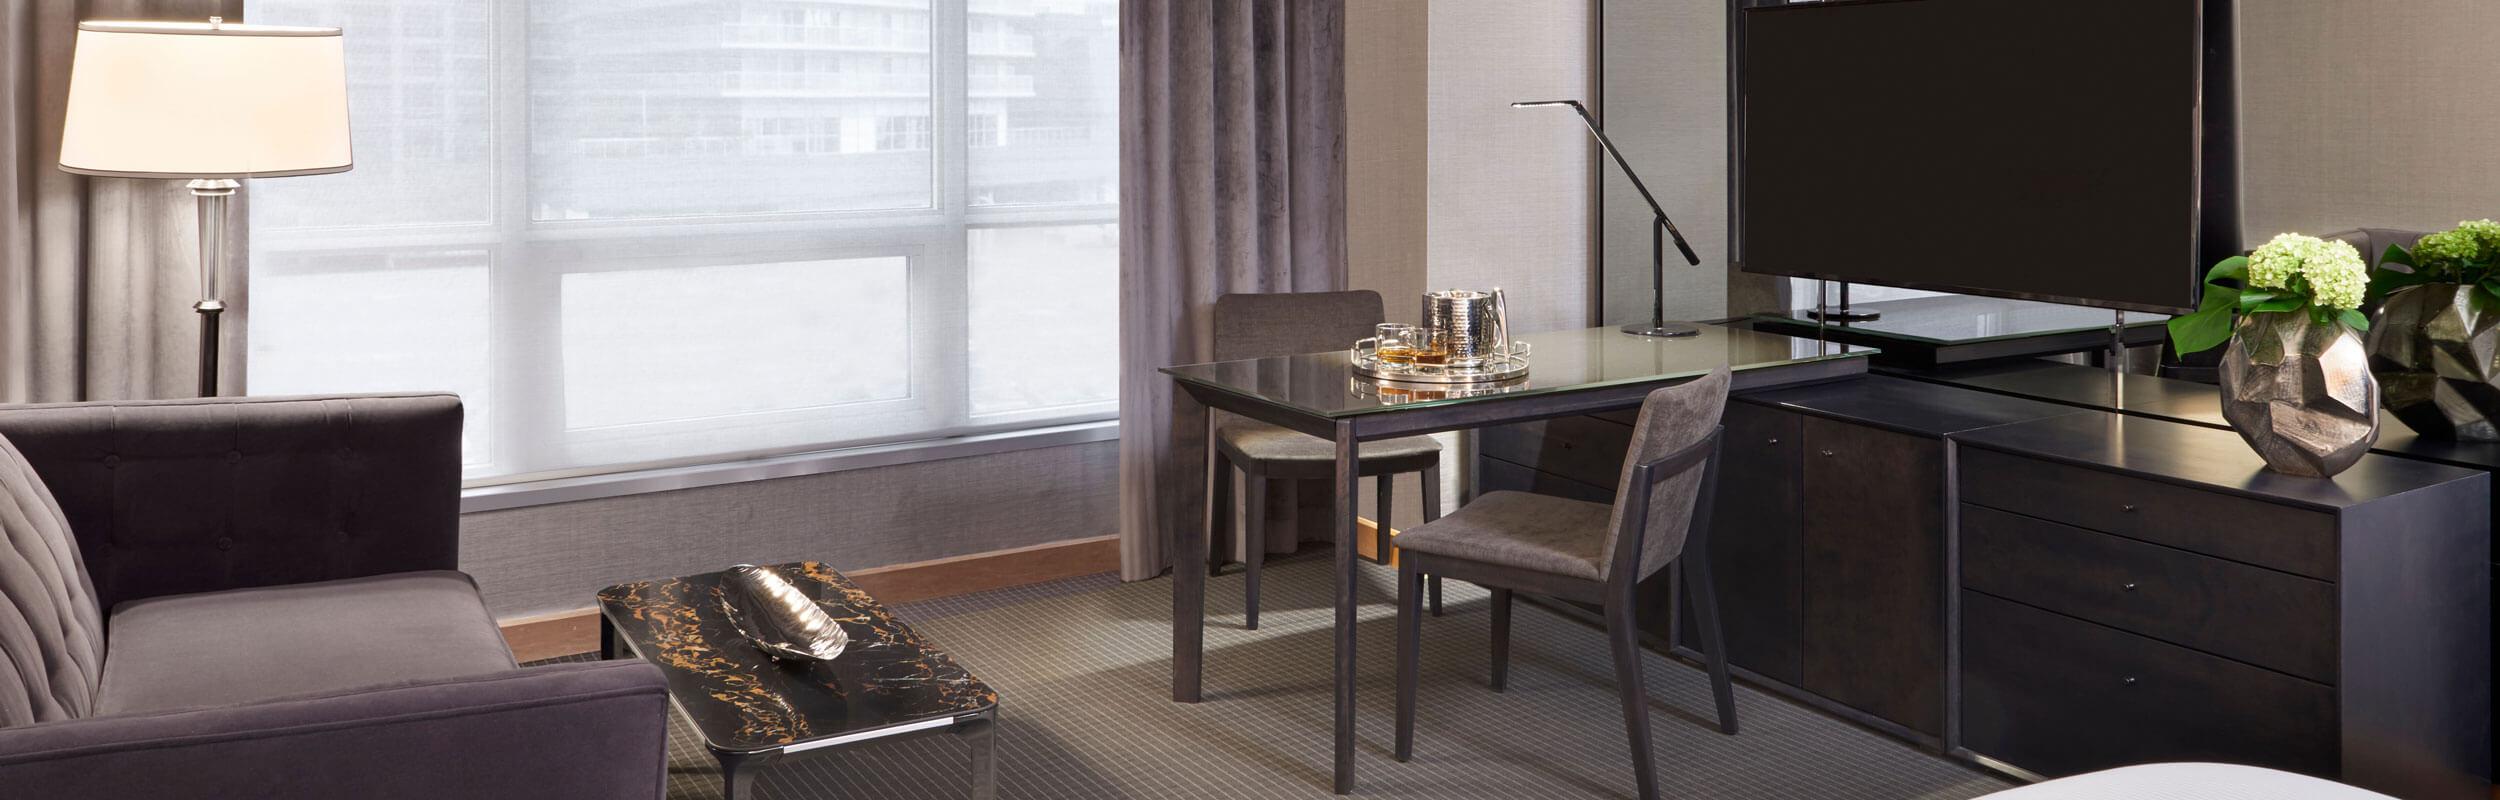 SoHo Hotel renovated luxury room